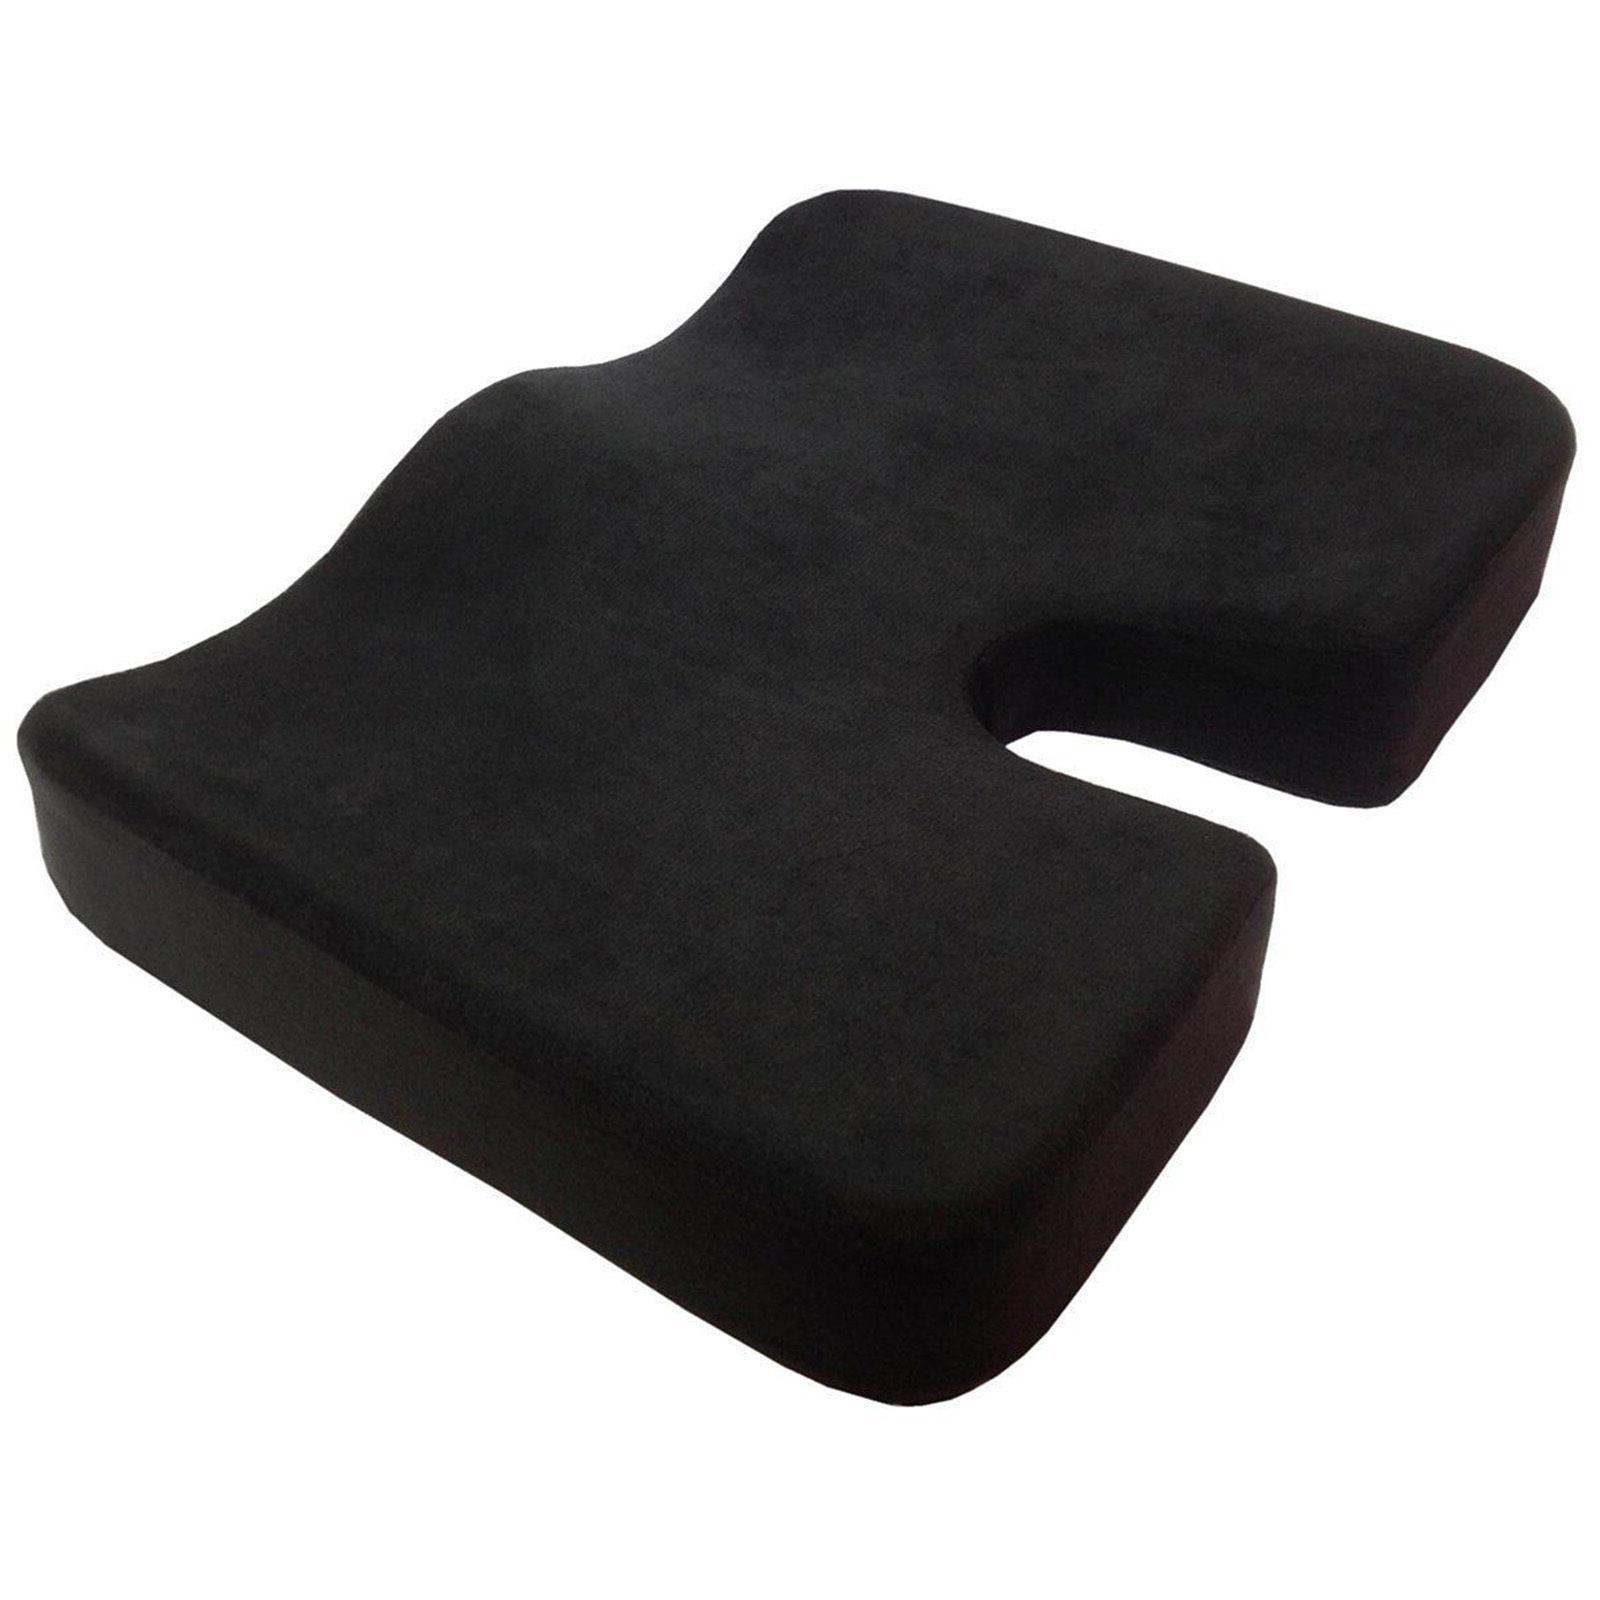 Truck Driver Seat Memory Tailbone Large Pillow